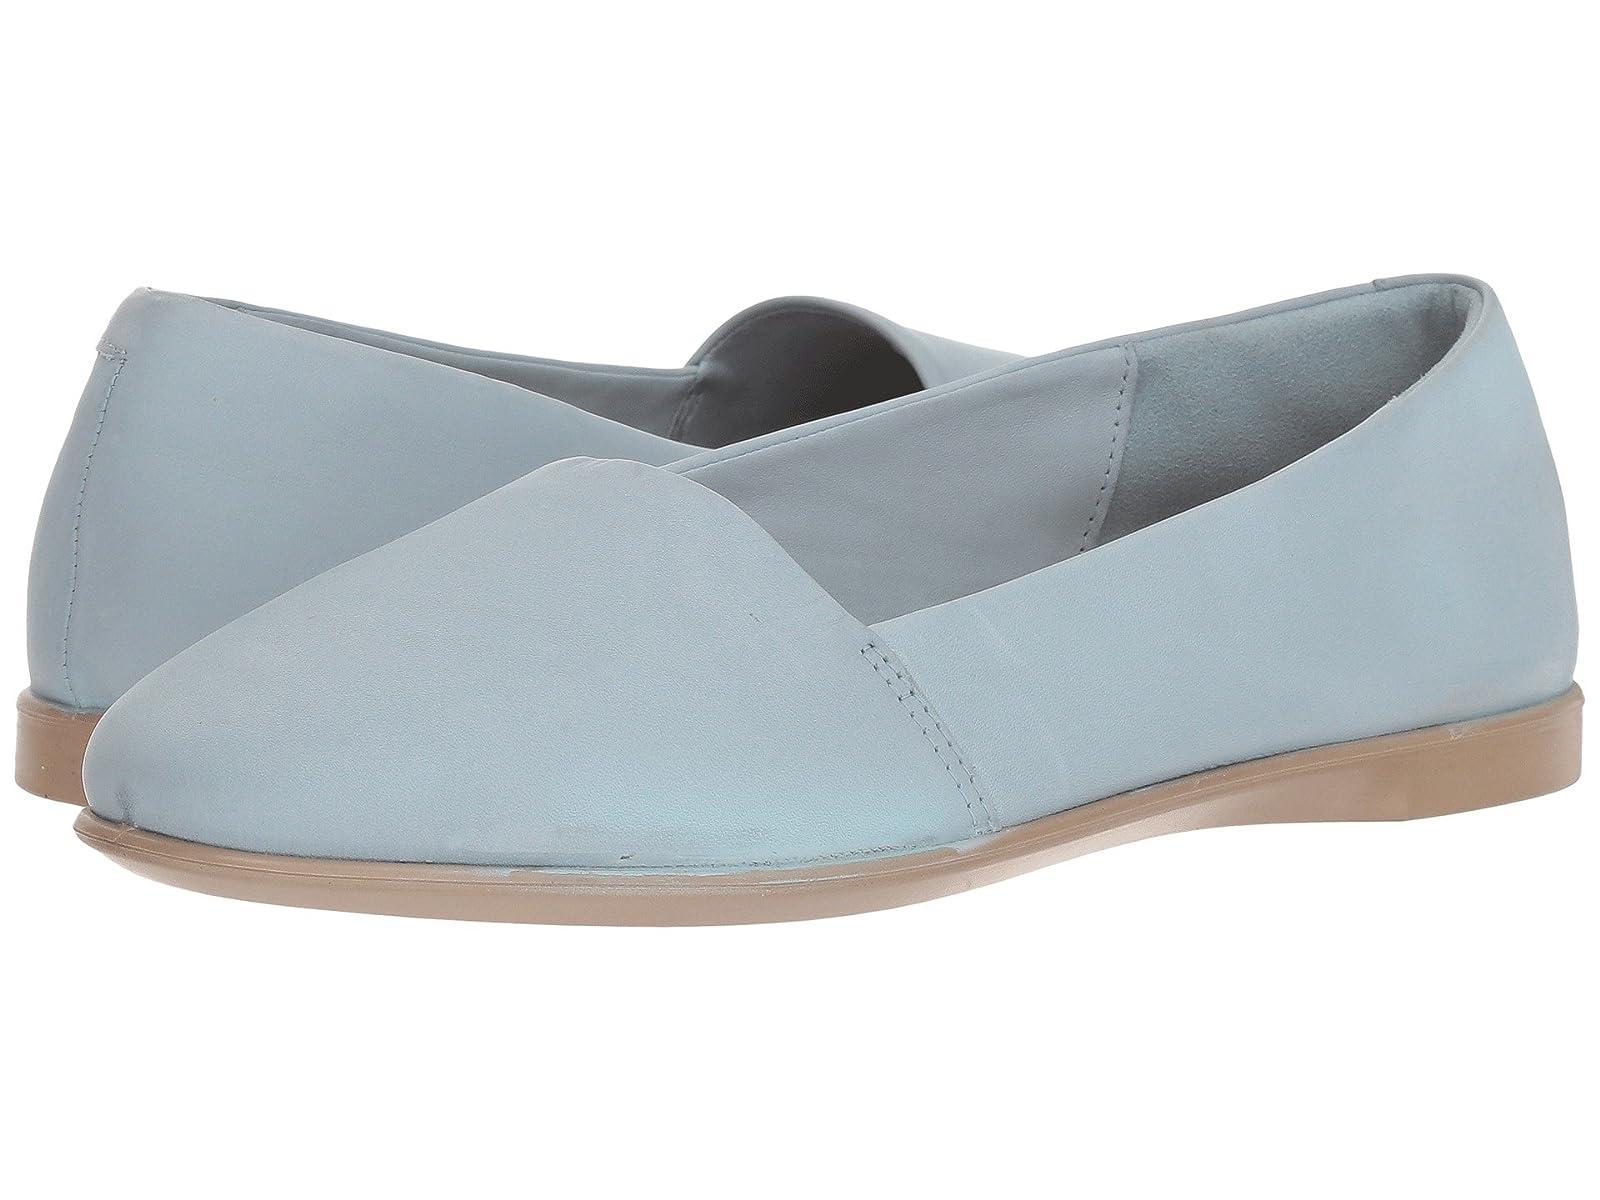 ECCO Incise Enchant Slip-OnAtmospheric grades have affordable shoes